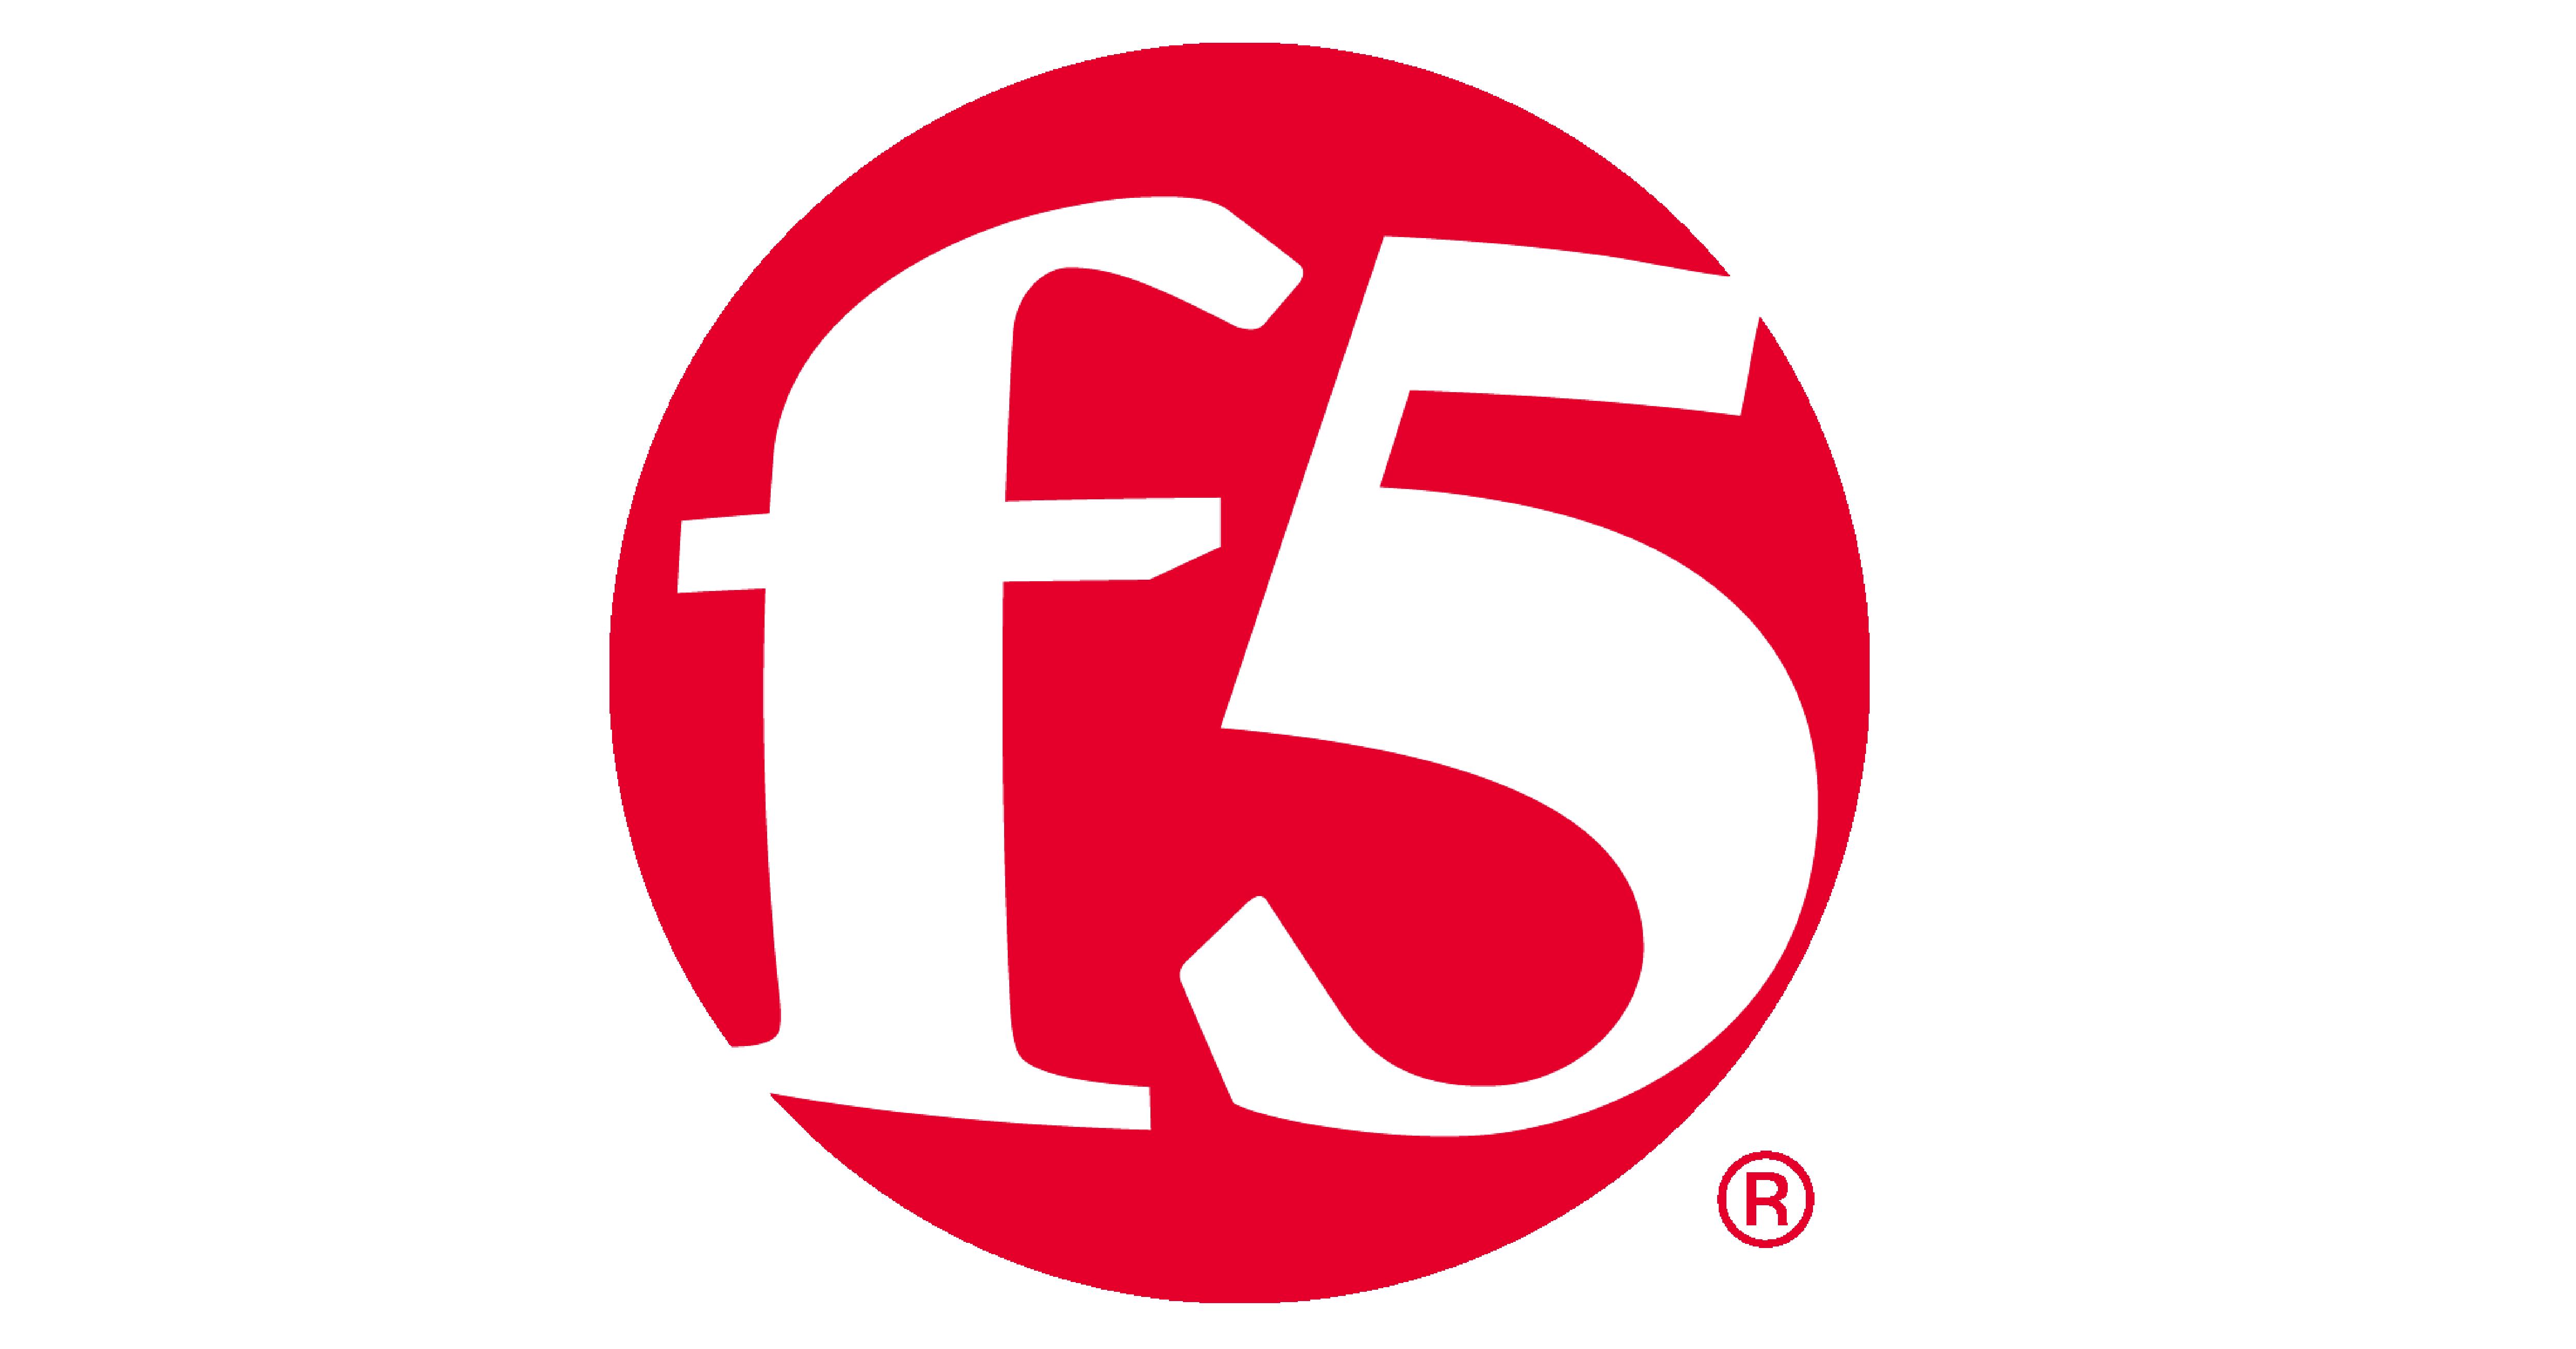 https://f.hubspotusercontent00.net/hubfs/2351800/Logo%20-%20F5%20Case%20Study.png